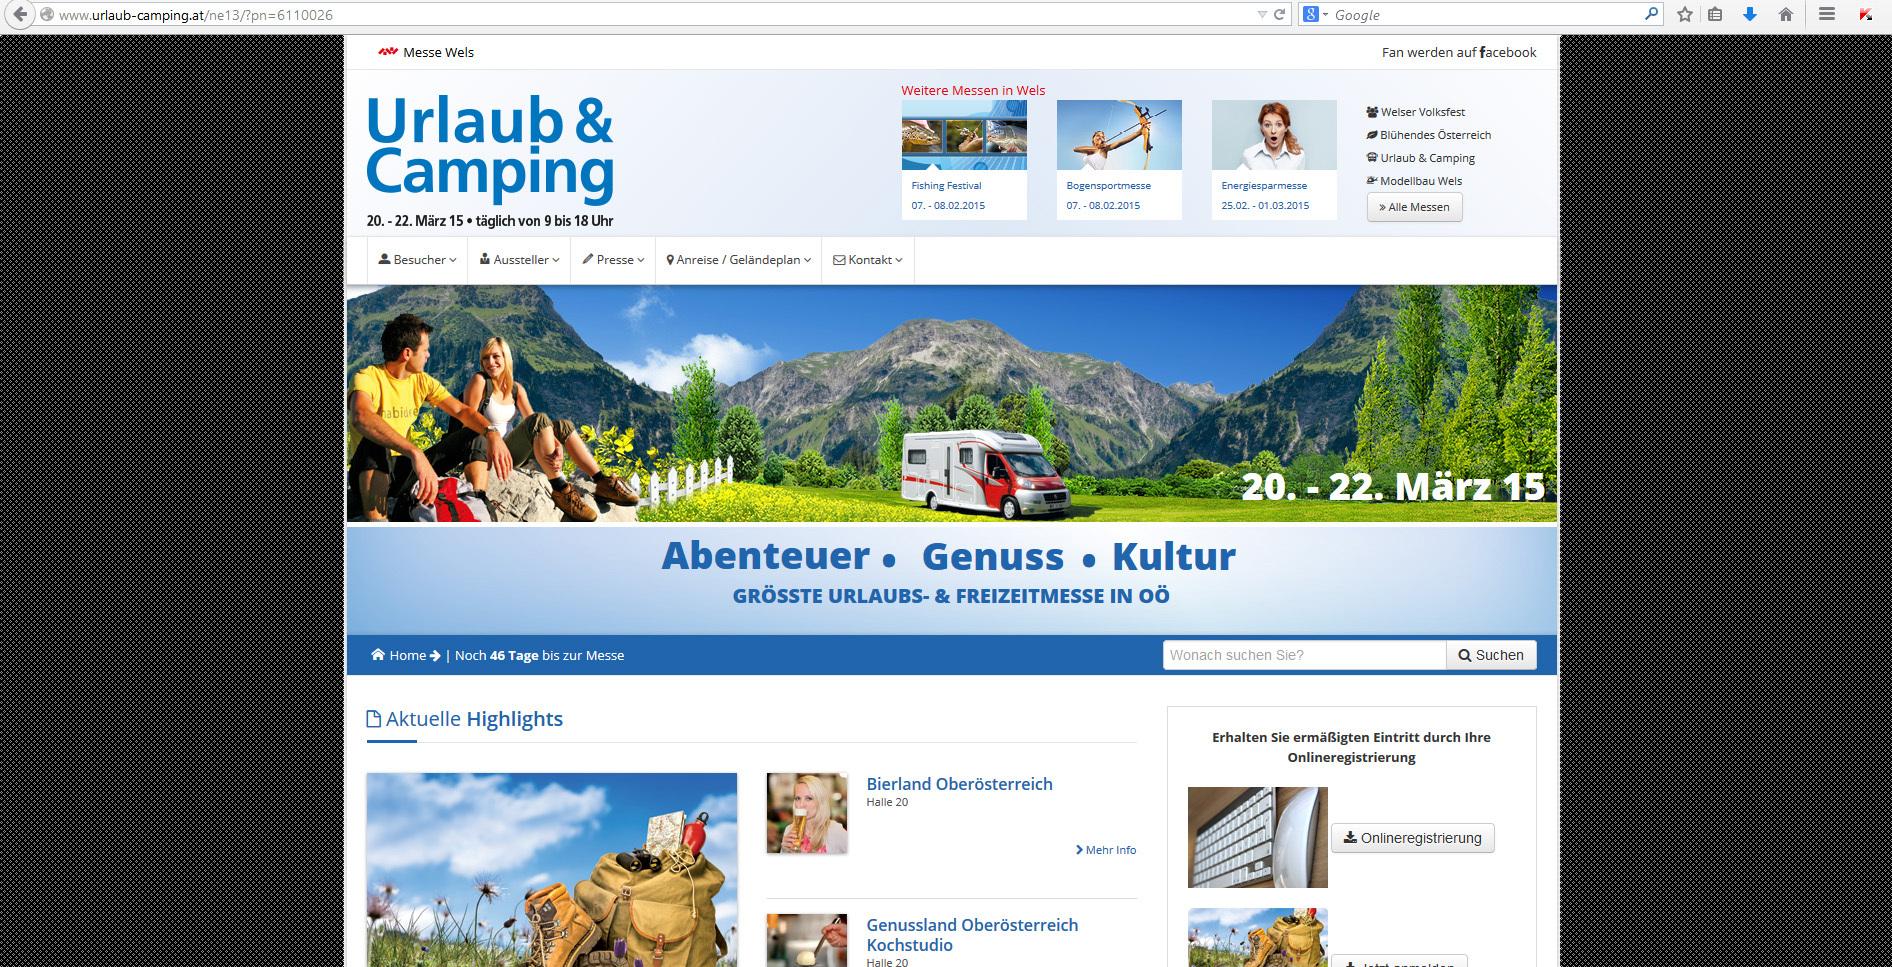 http://www.urlaub-camping.at